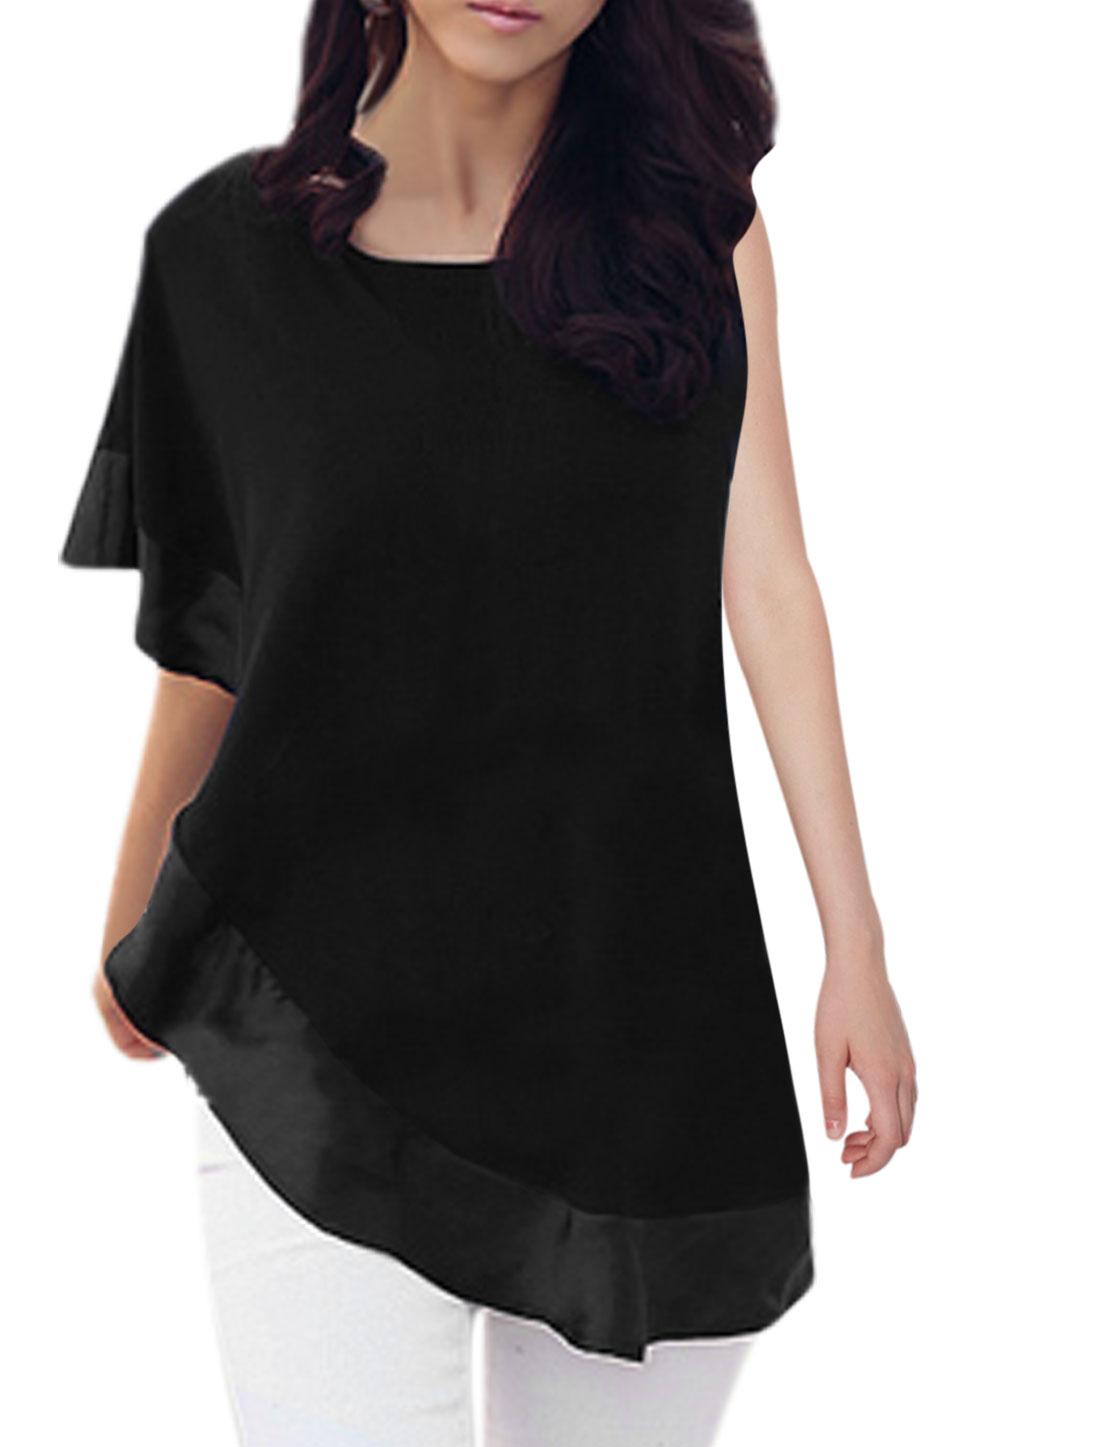 Women Round Neck Asymmetrical Sleeve Panel Design Top Black XS